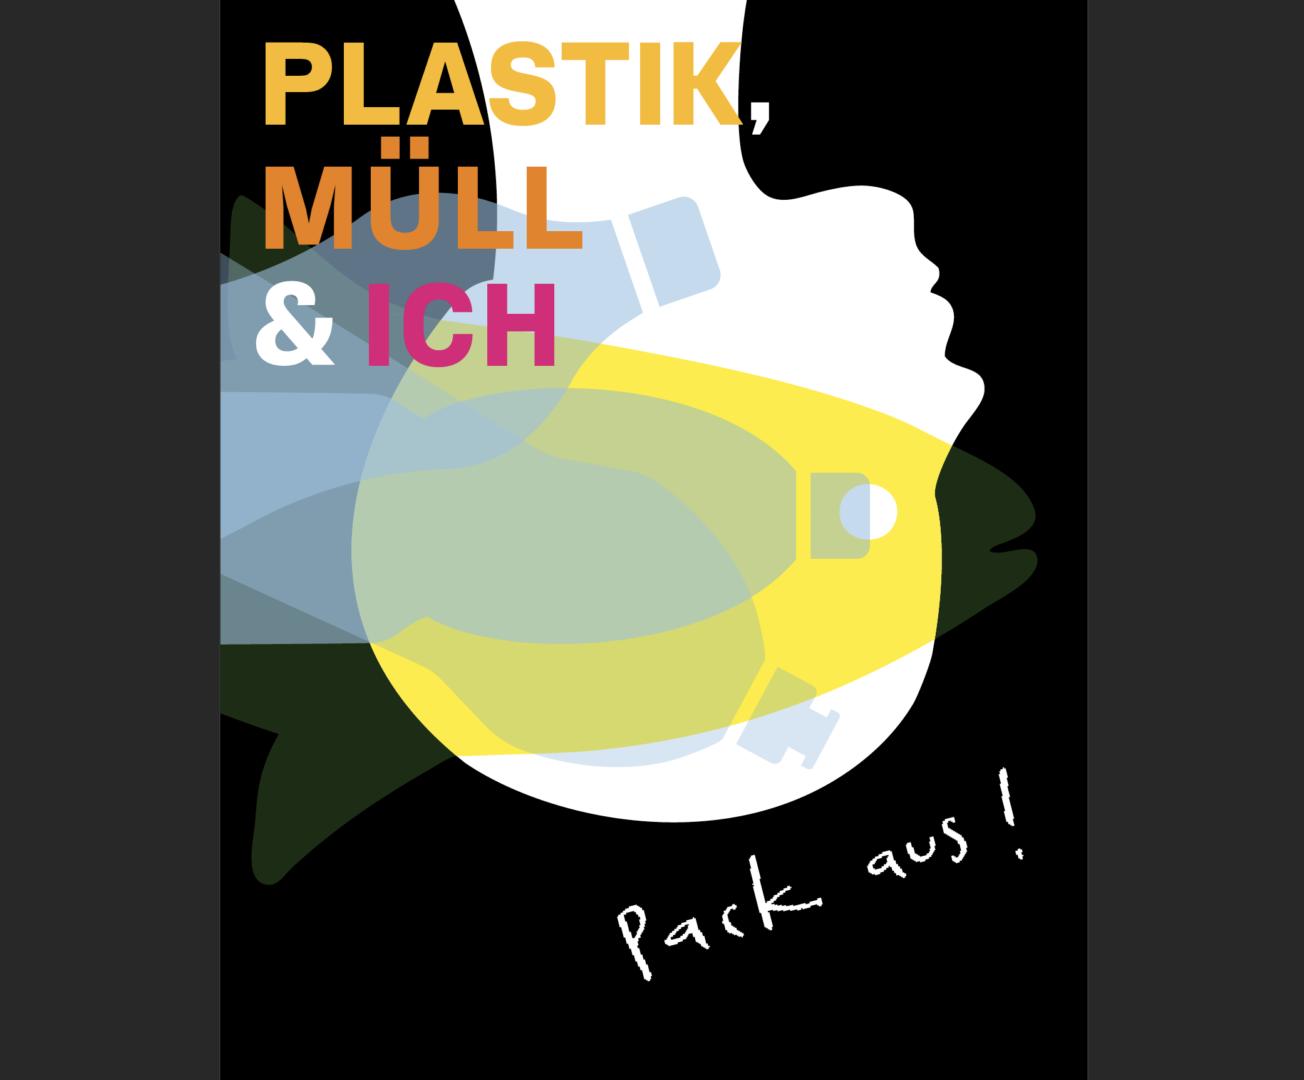 Das große Thema PLASTIK